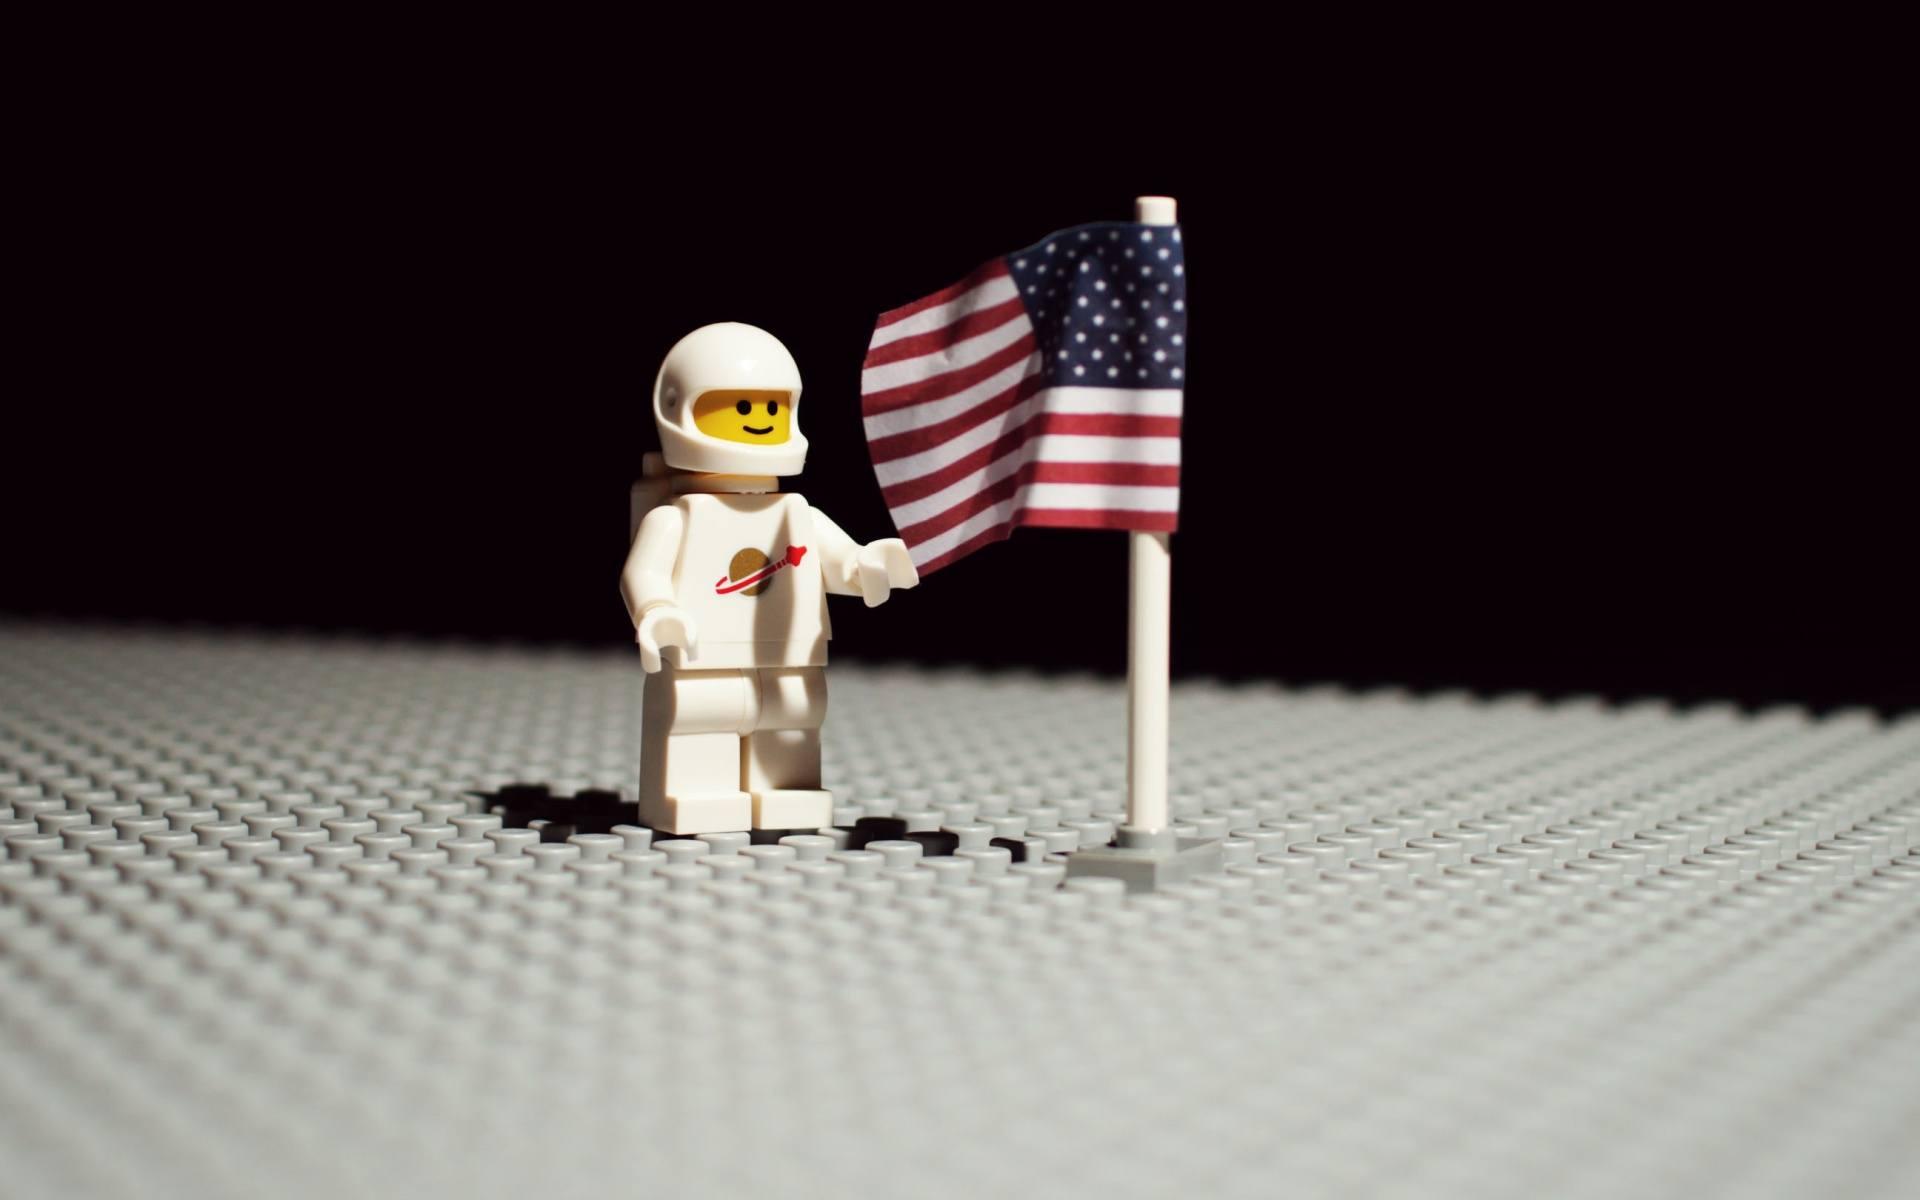 American Flag Wallpaper 005